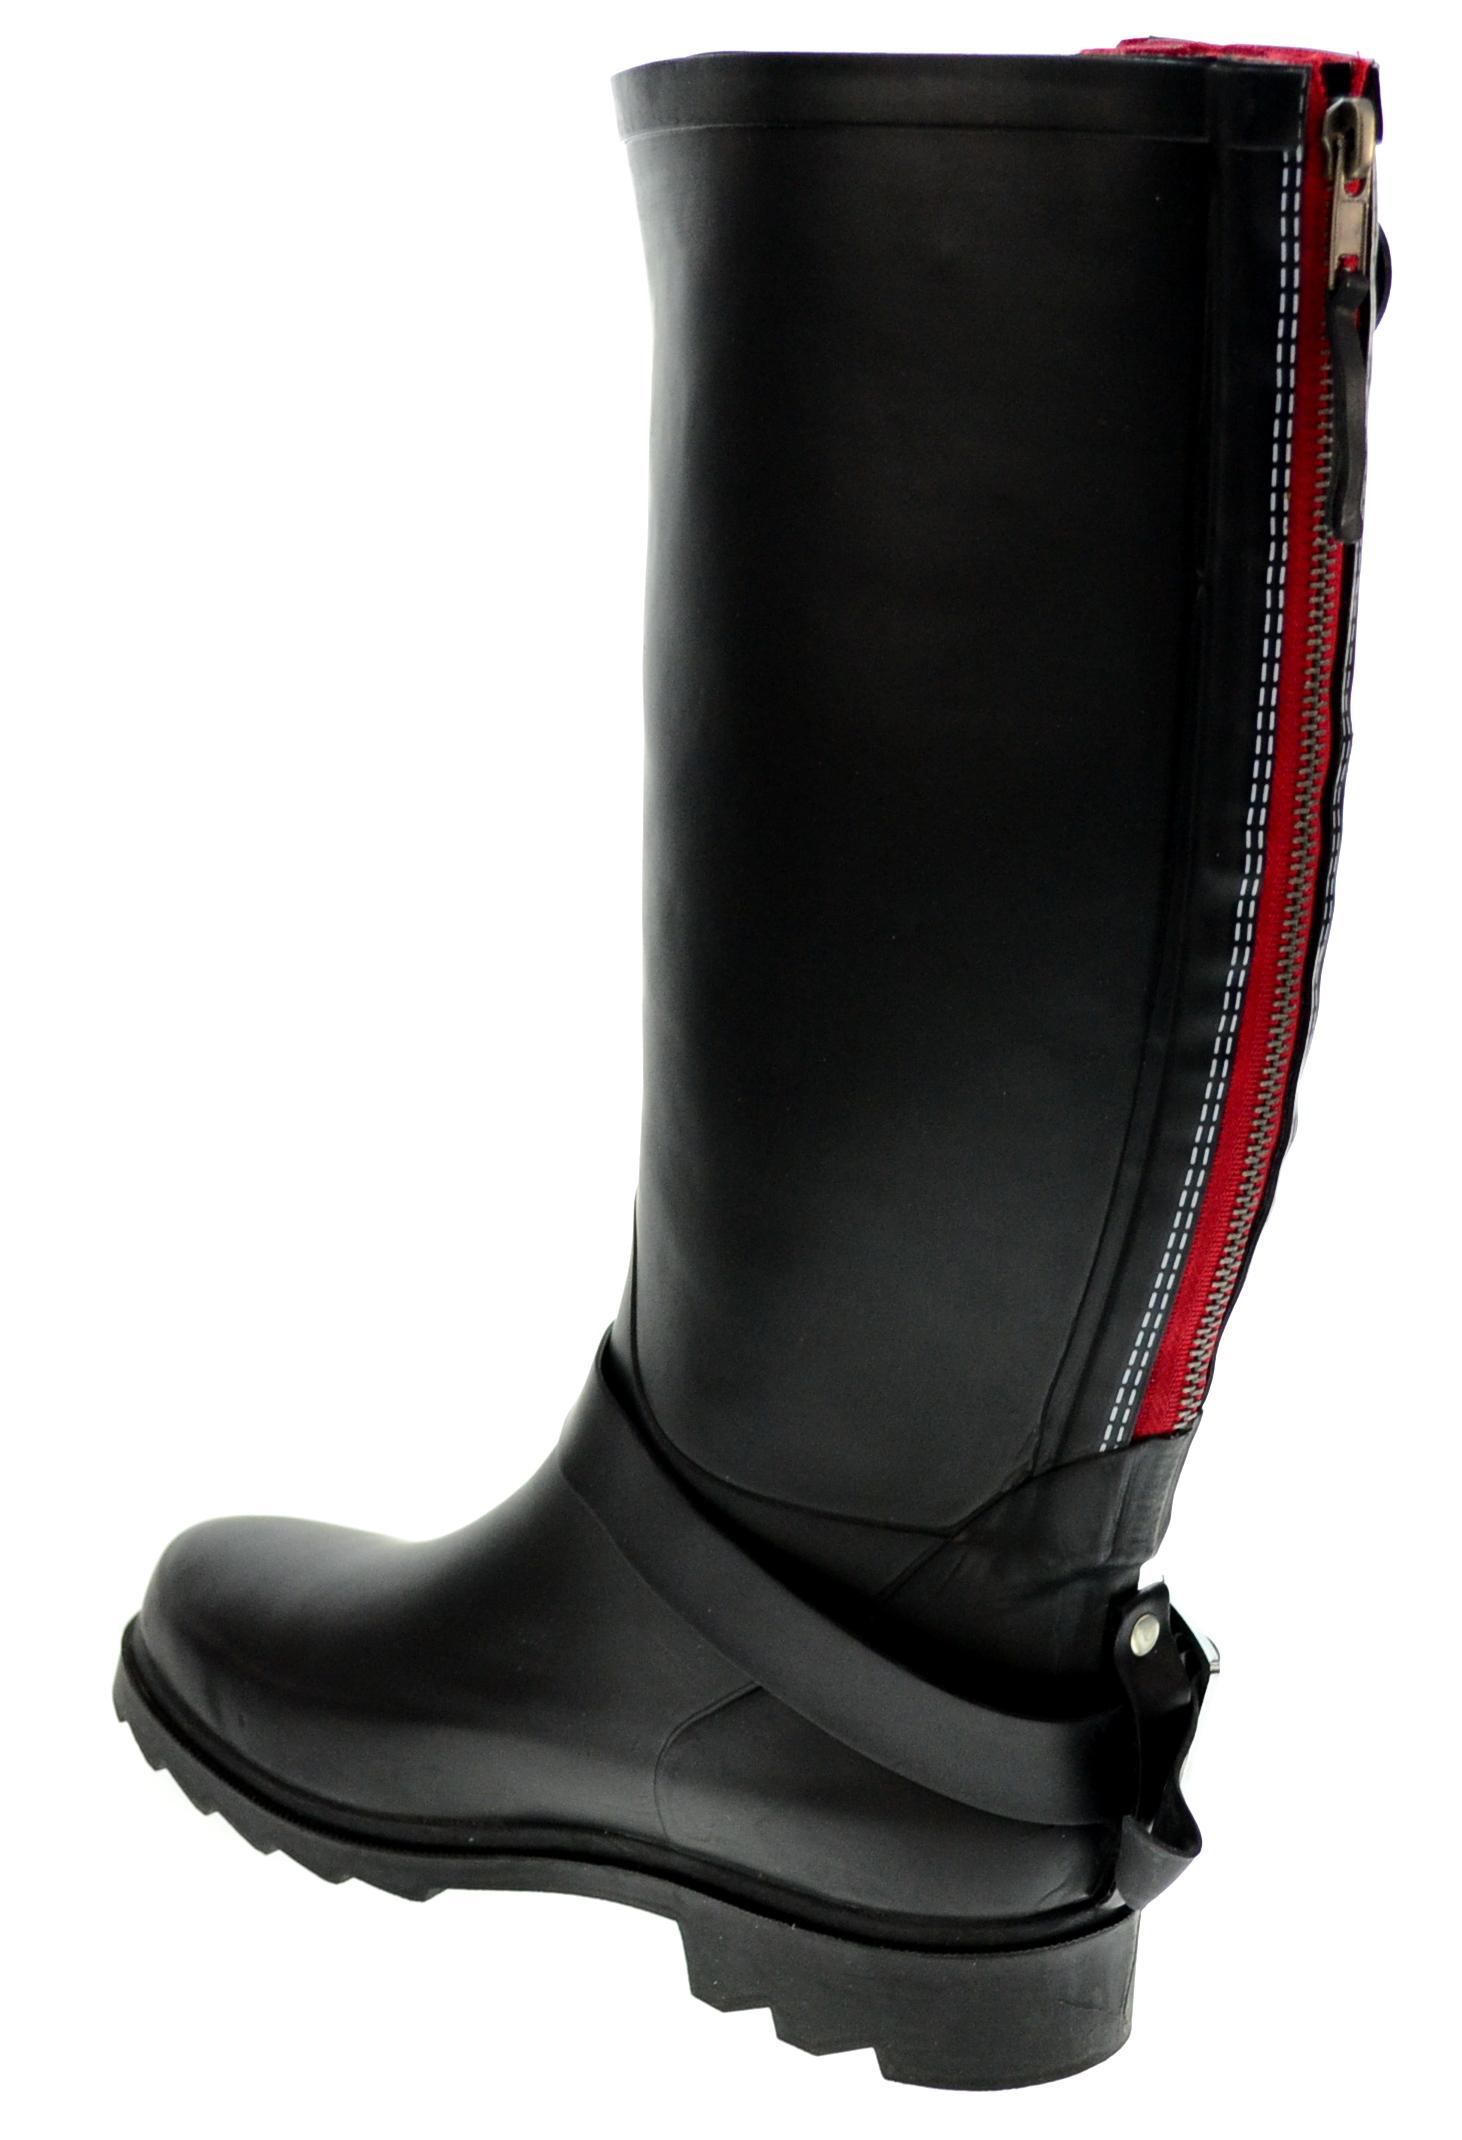 henry ferrera s black knee high rubber boots ebay